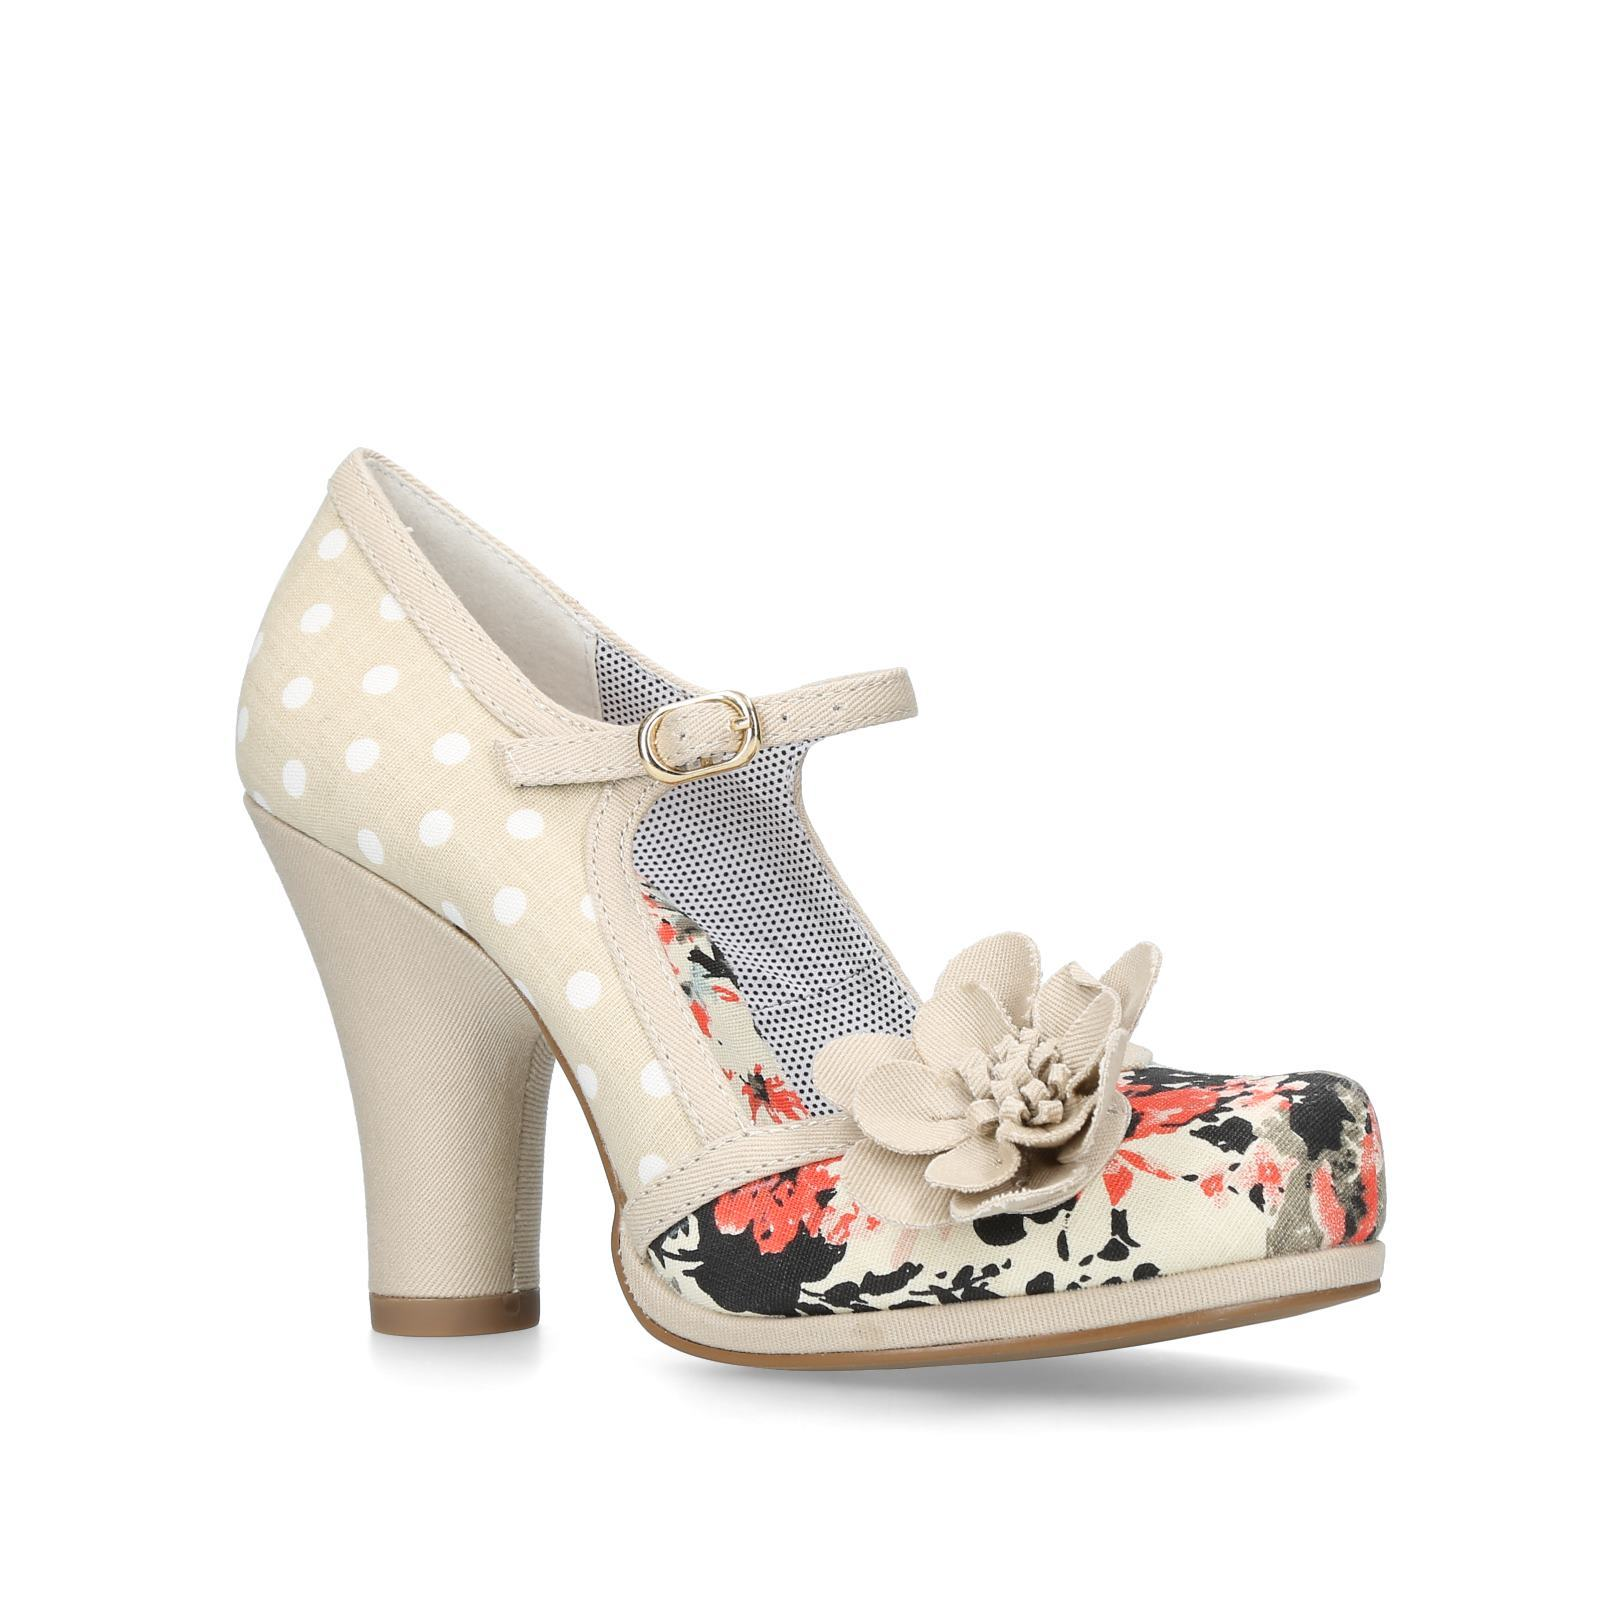 TANYA Rubyshoo Tanya Beige Fabric Occasion Heels Block Heel by RUBY SHOO 4ad465739c